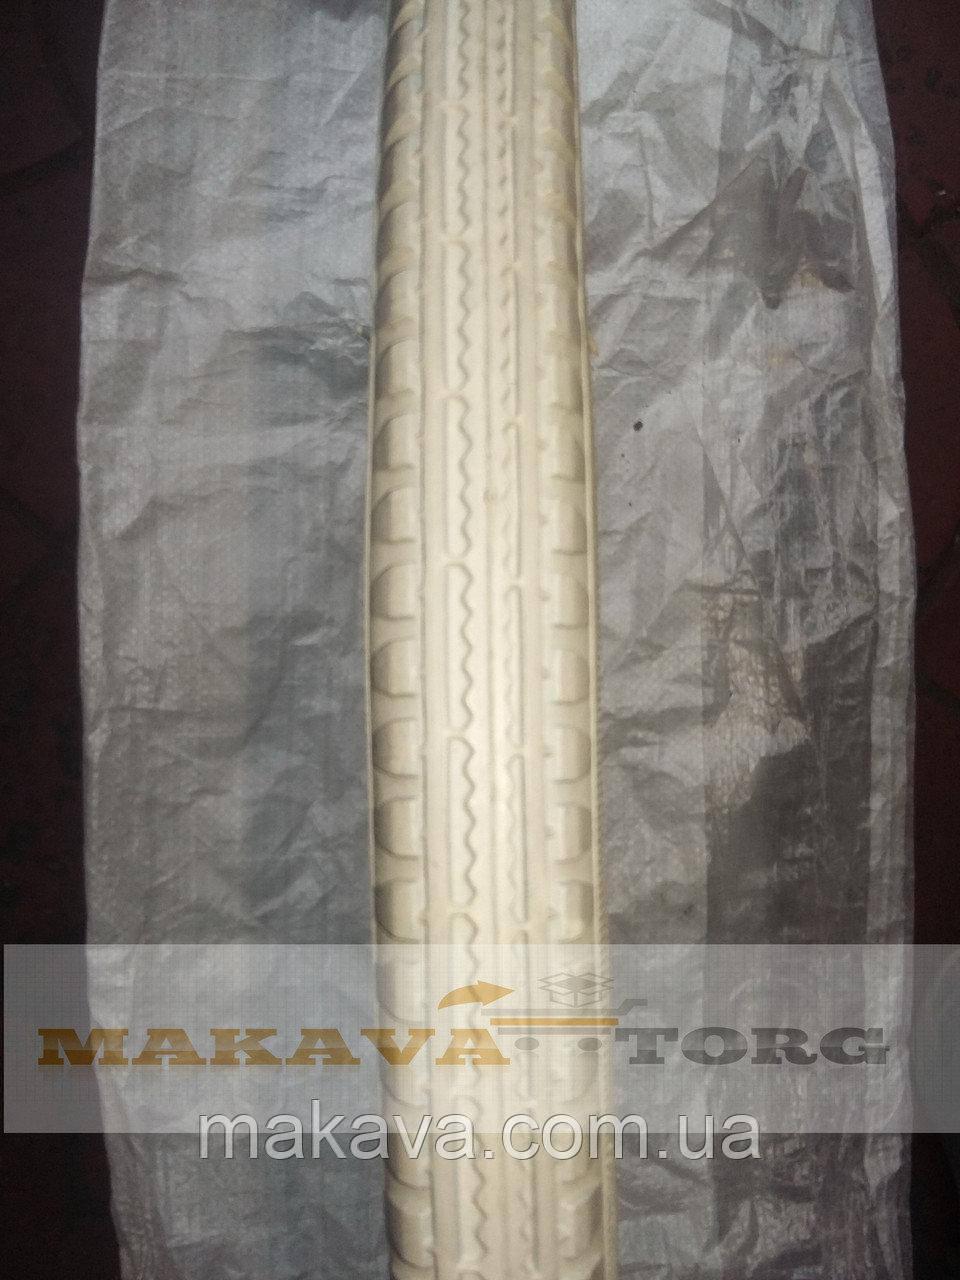 Покрышка на коляску HS-110 22*1-3/8 (501-37) Swallow - Индонезия